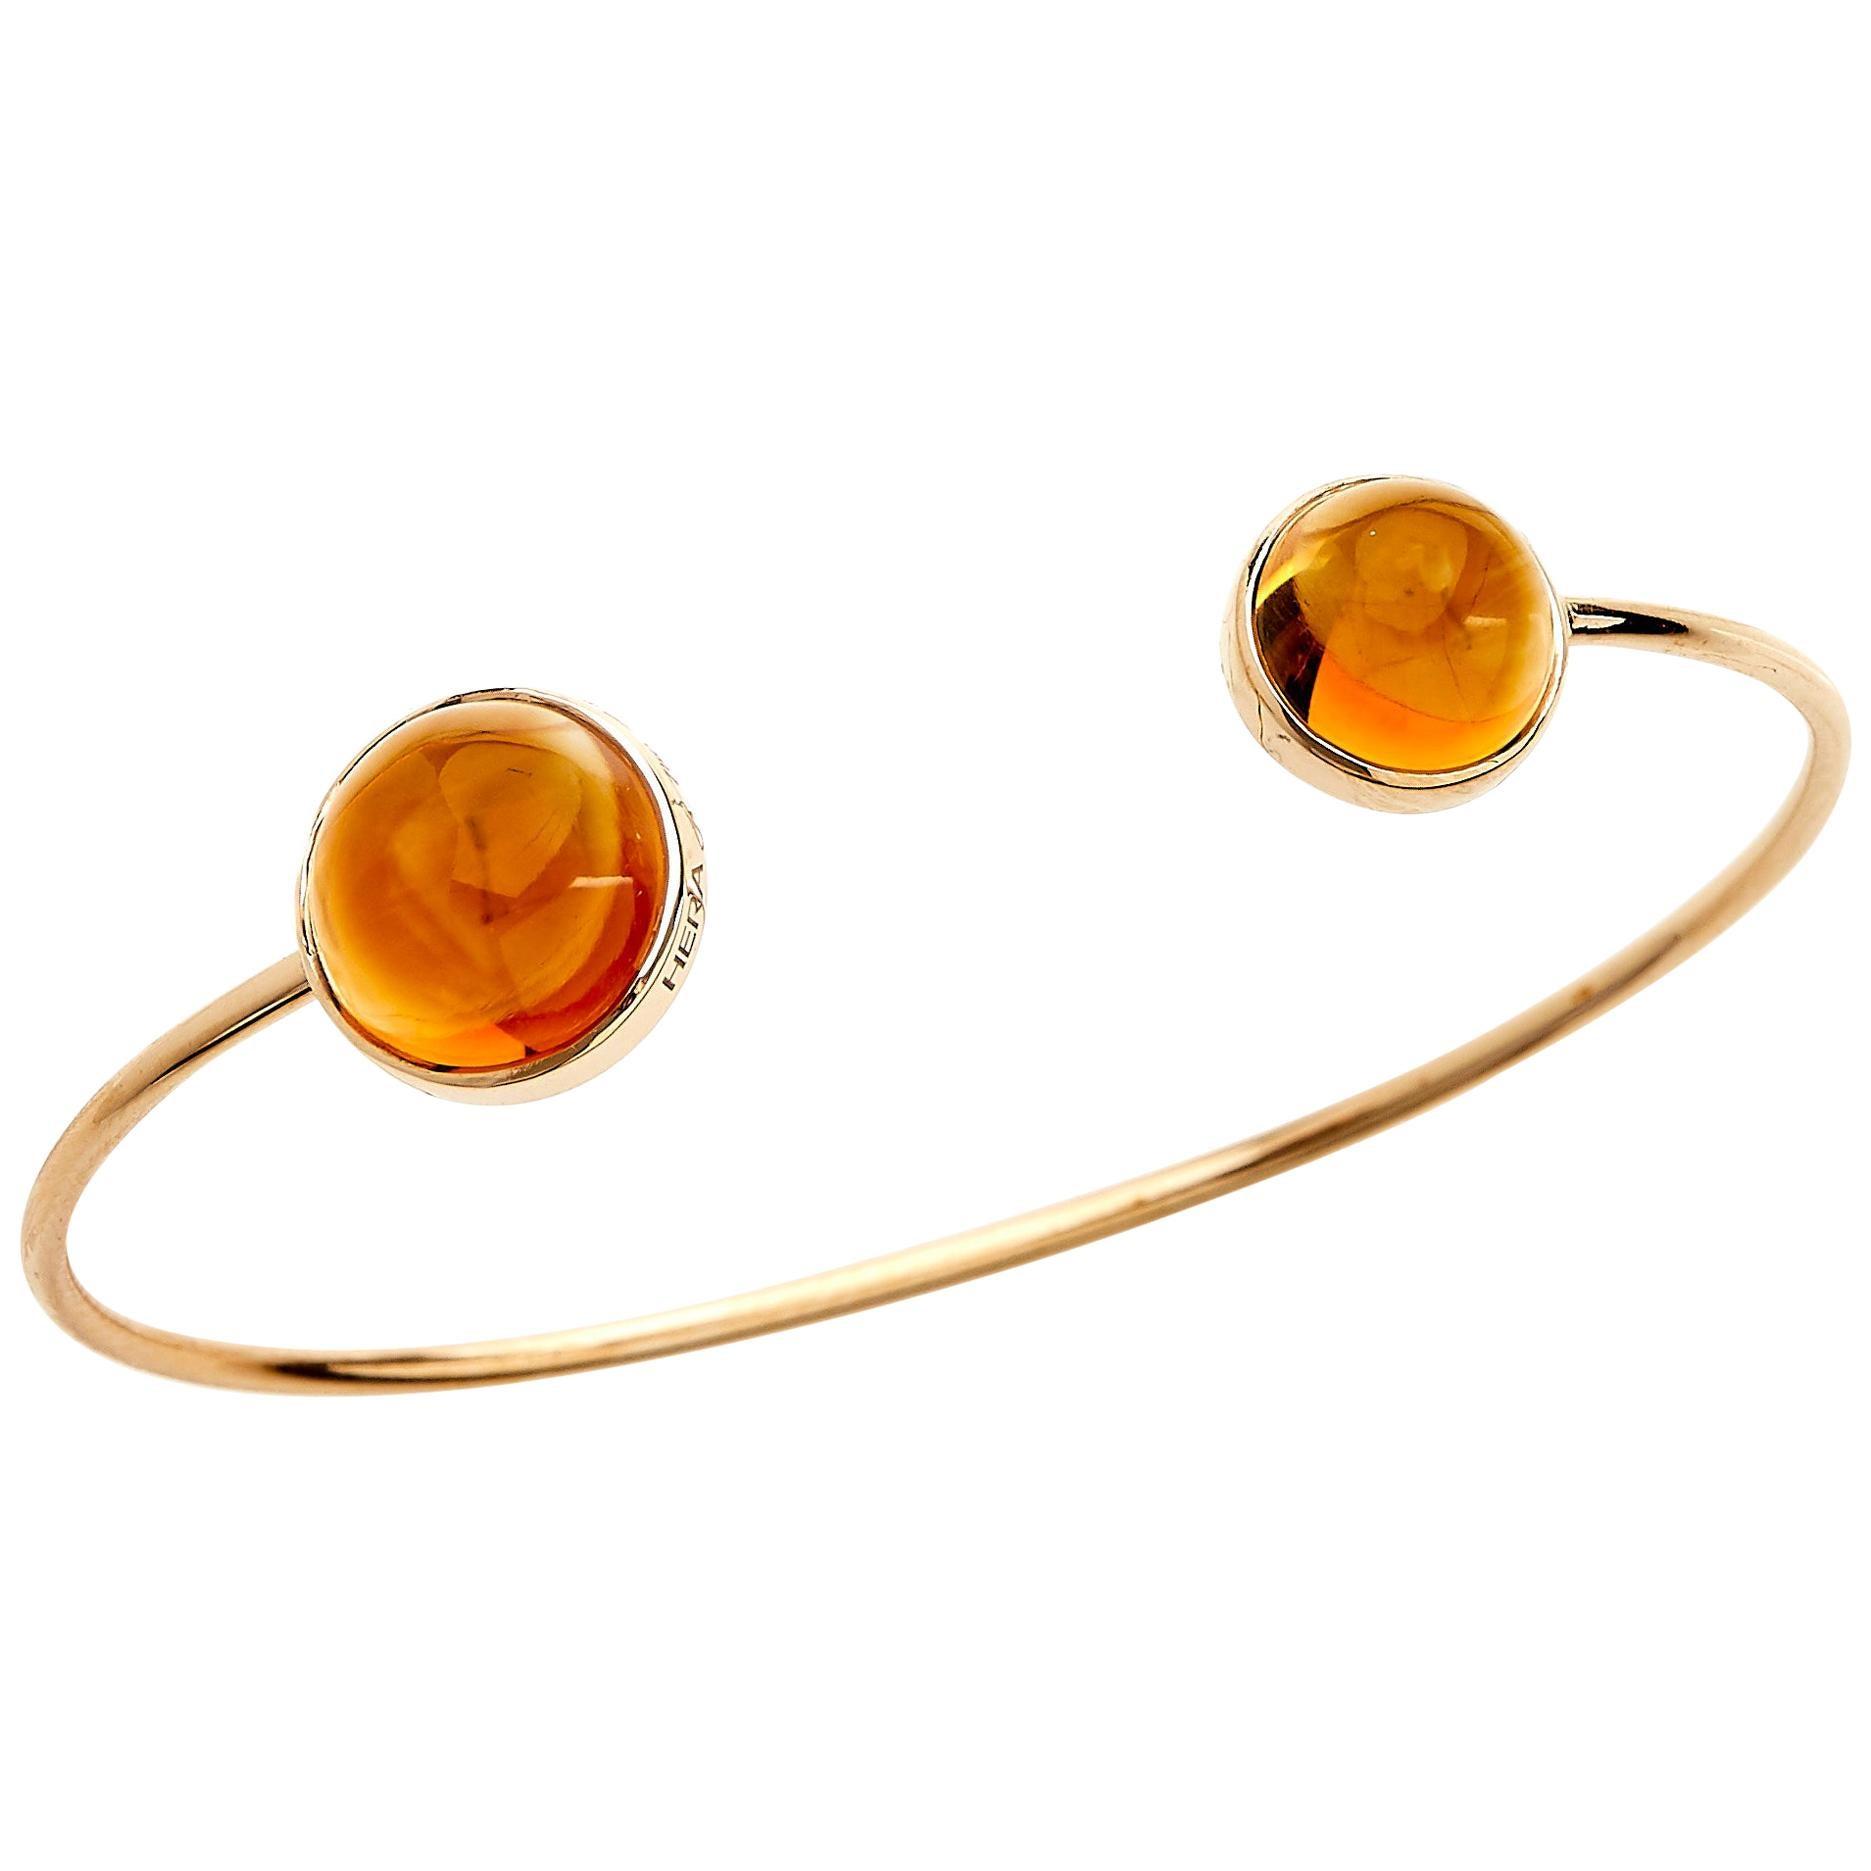 18 Karat Rose Gold Cuff Bangle Bracelet with 8.94 Carat Cabochon Cut Citrines